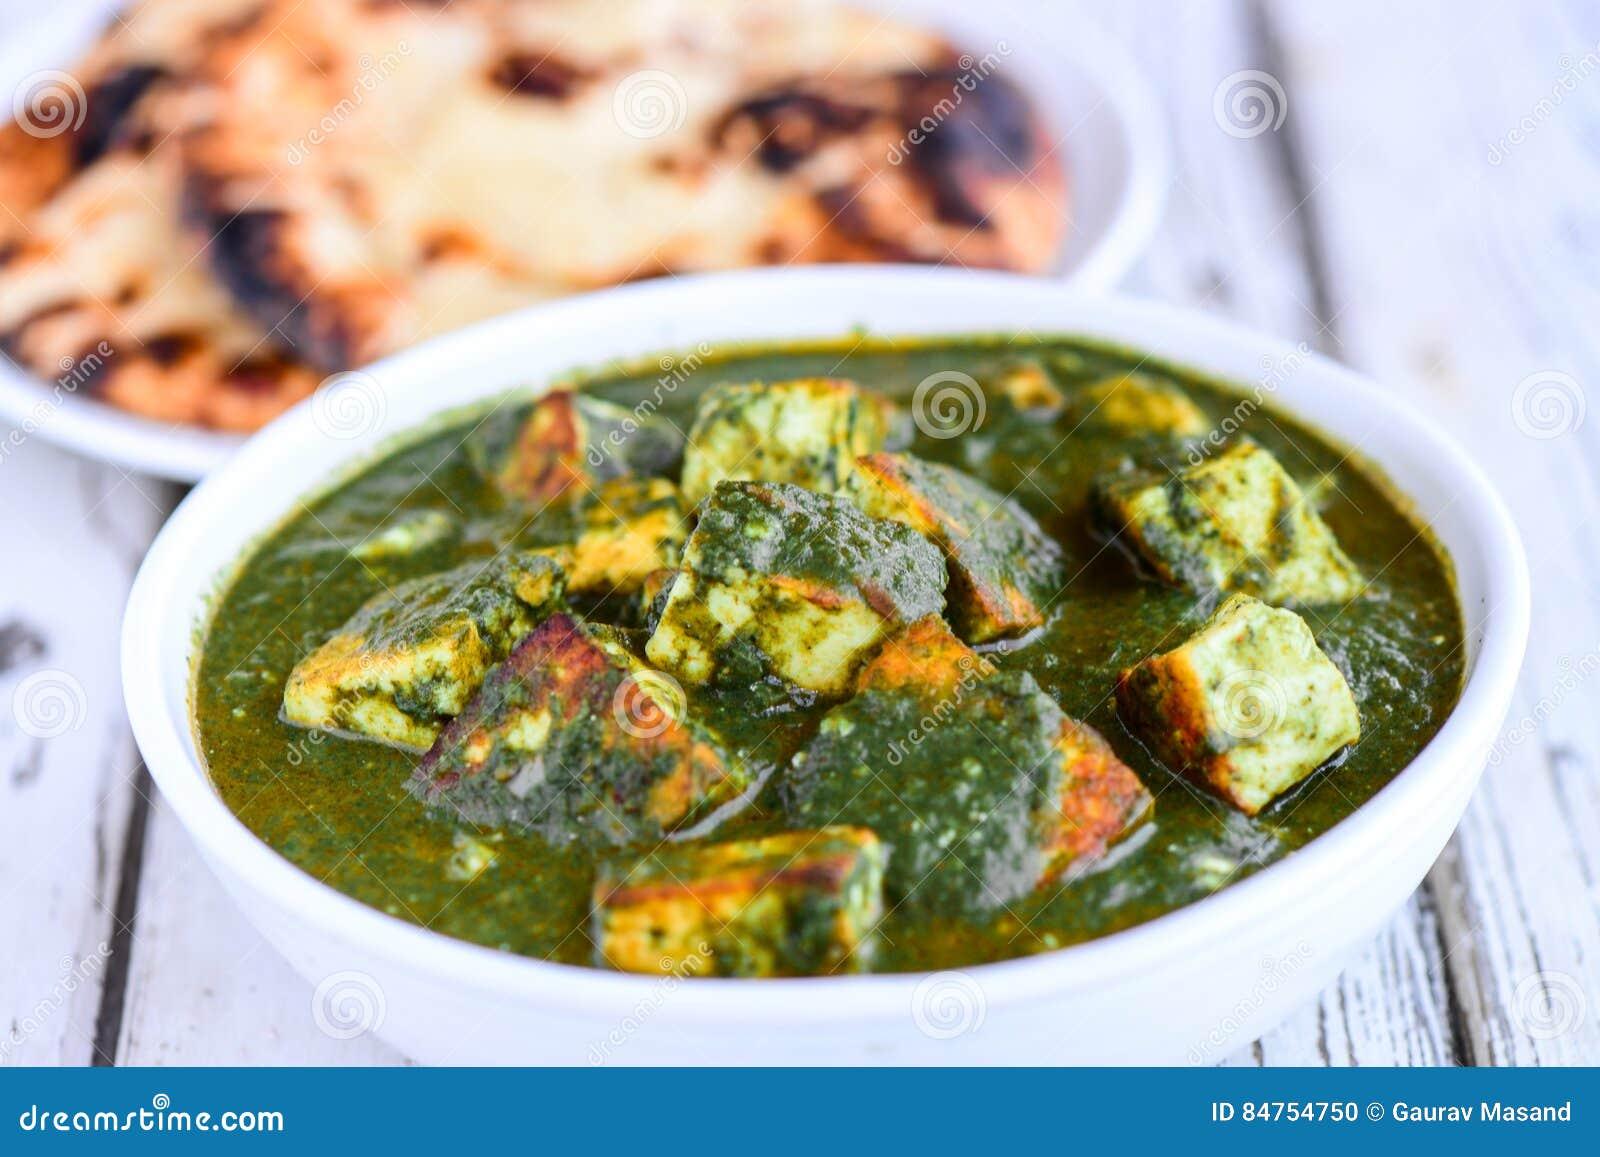 Indian meal-Palak paneer and tandoori roti